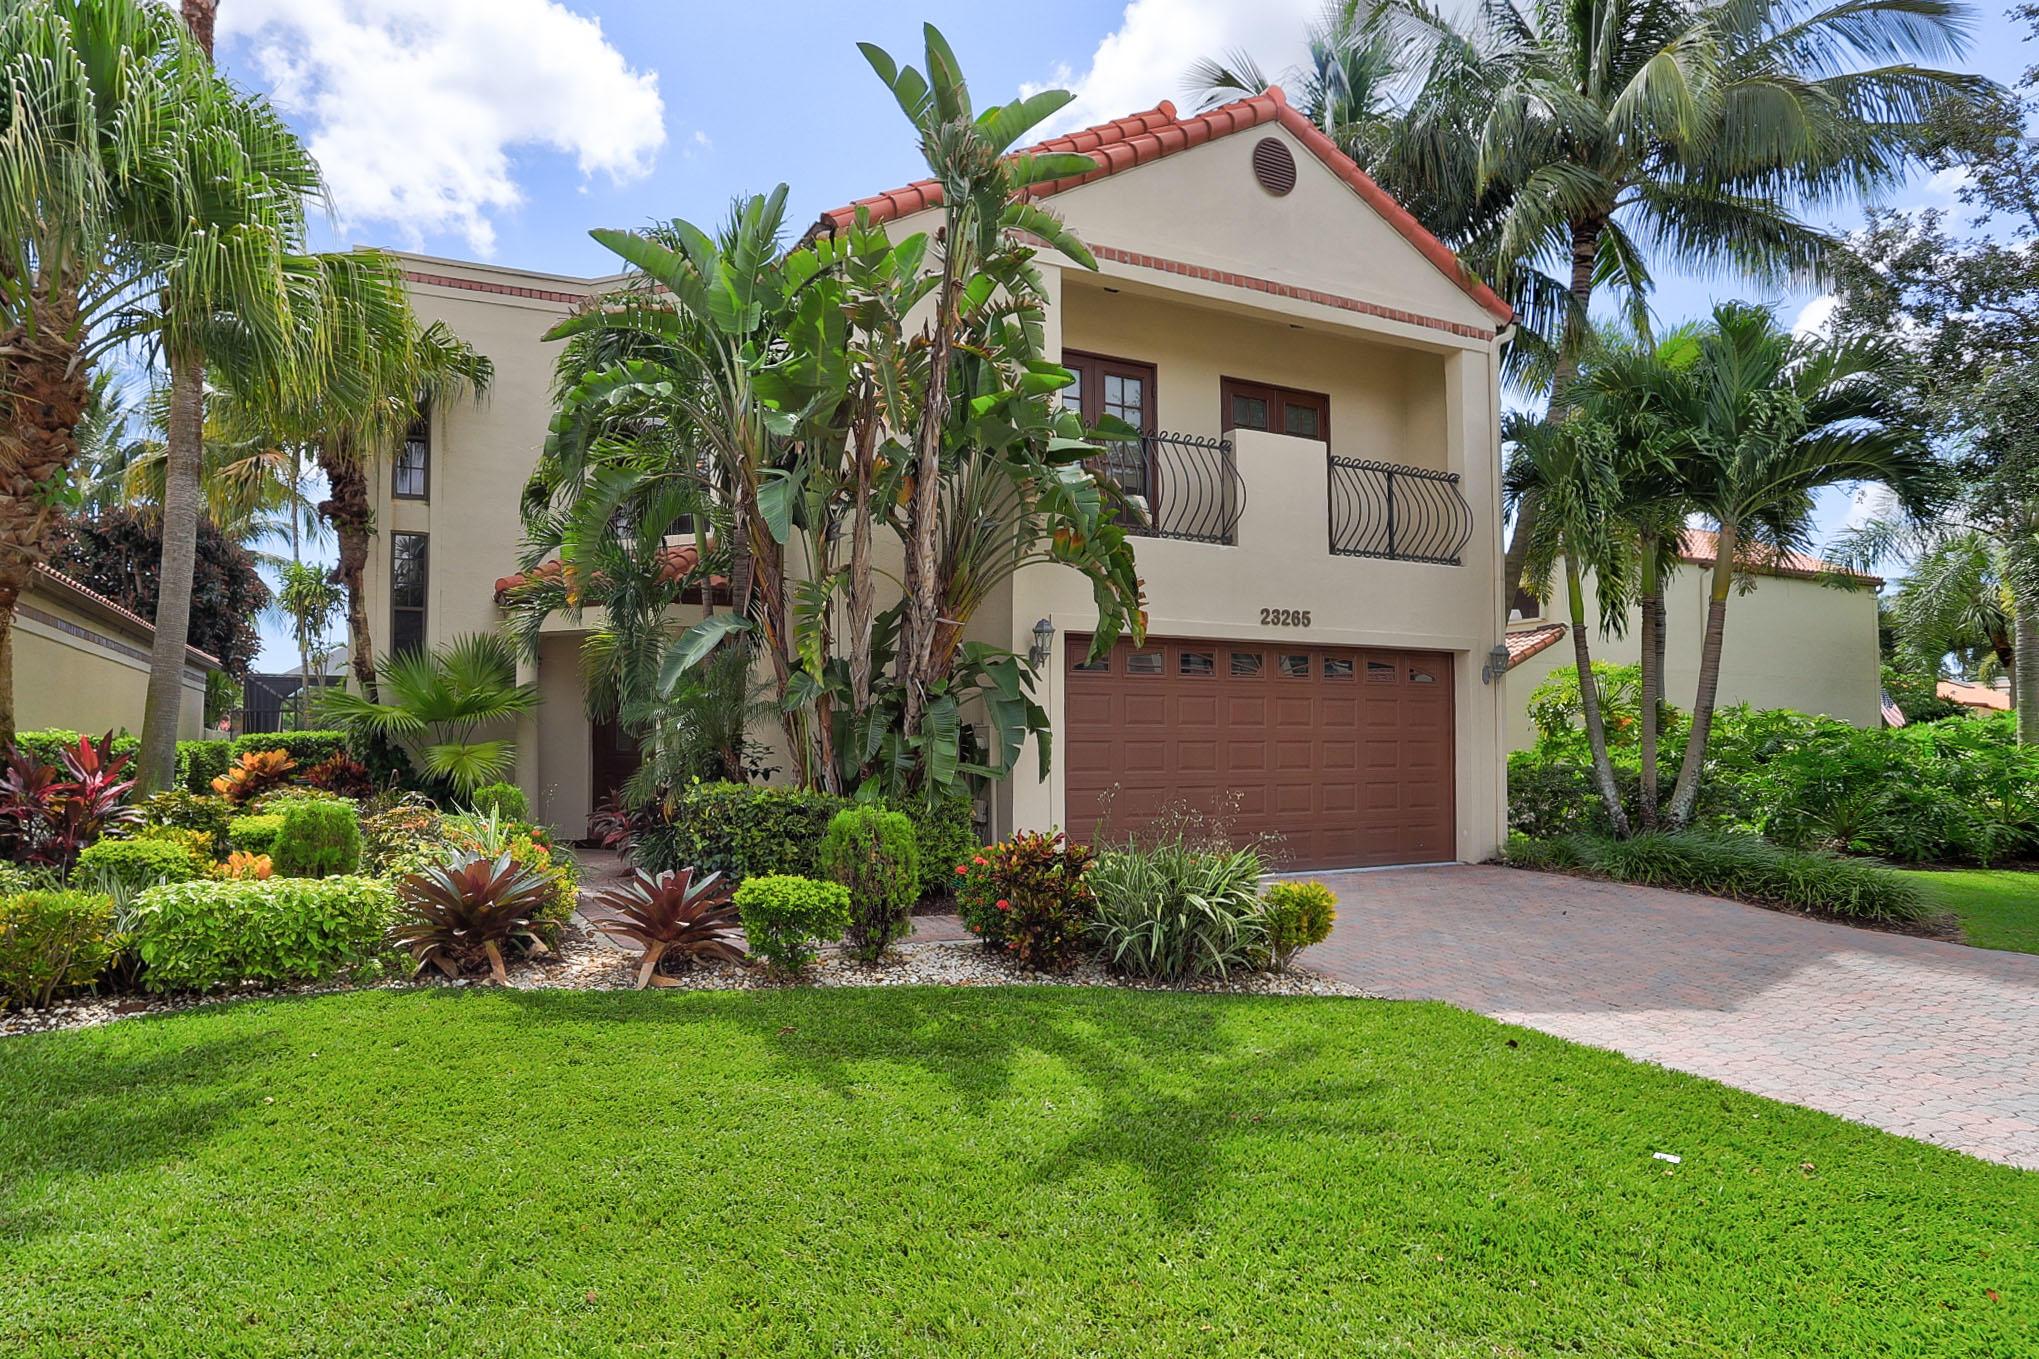 Photo of  Boca Raton, FL 33433 MLS RX-10645374